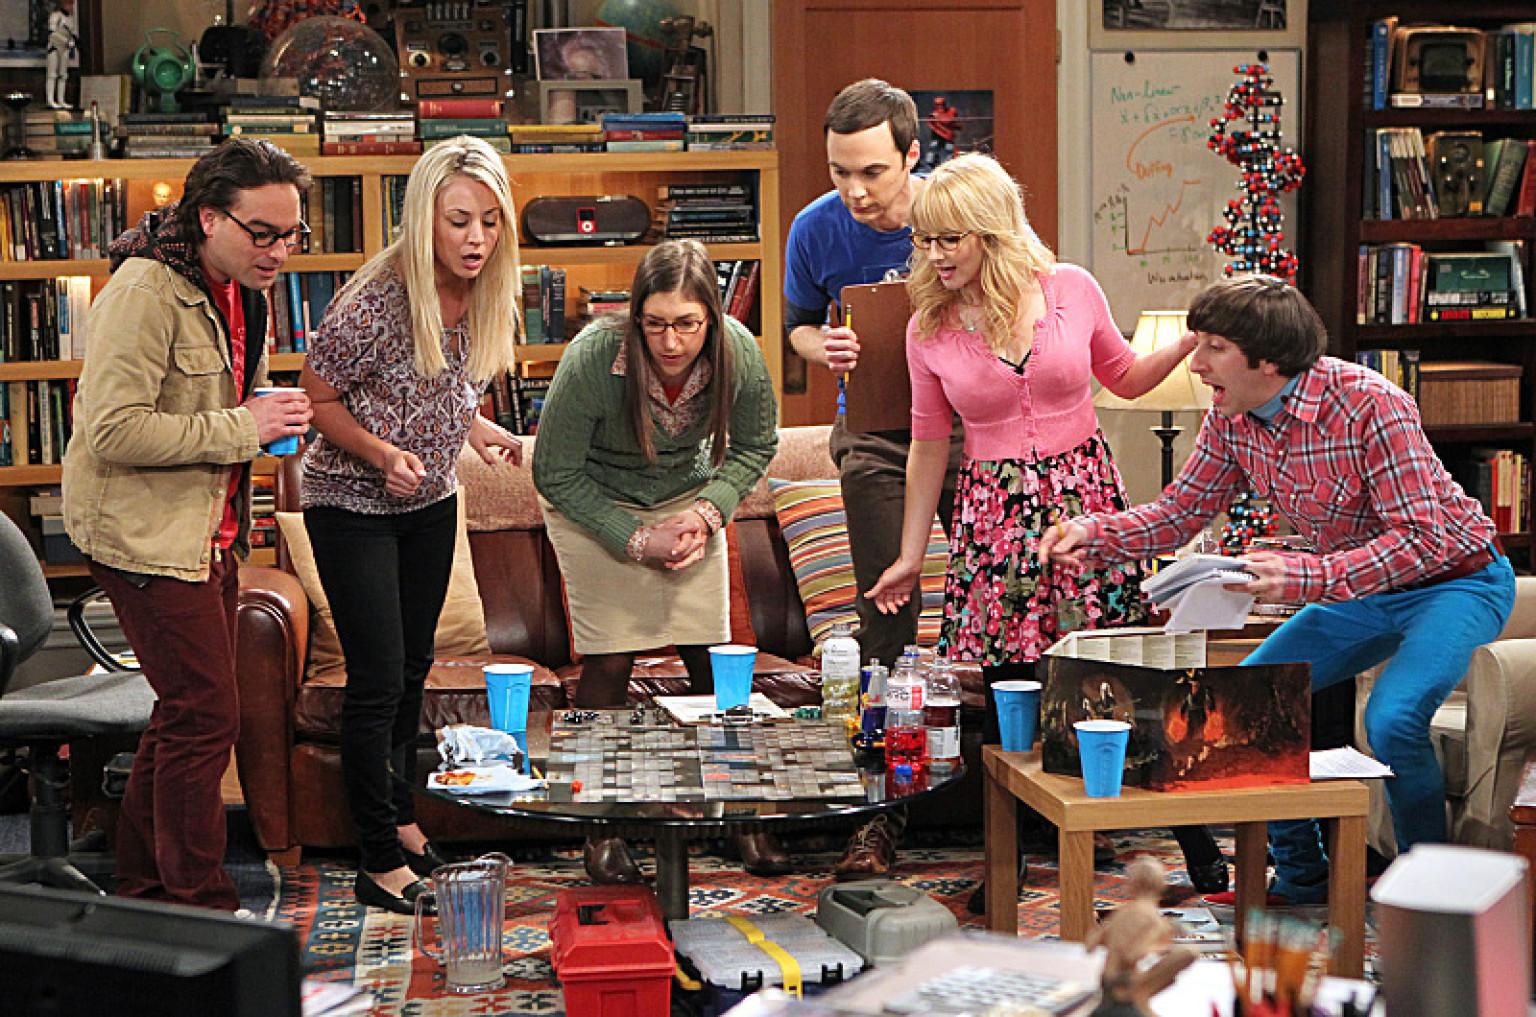 Christine Baranski Big Bang Theory Porn - 'Big Bang Theory' Season 7: Johnny Galecki, Melissa Rauch And More On  Family Members, Sex And Dream Guest Stars | HuffPost